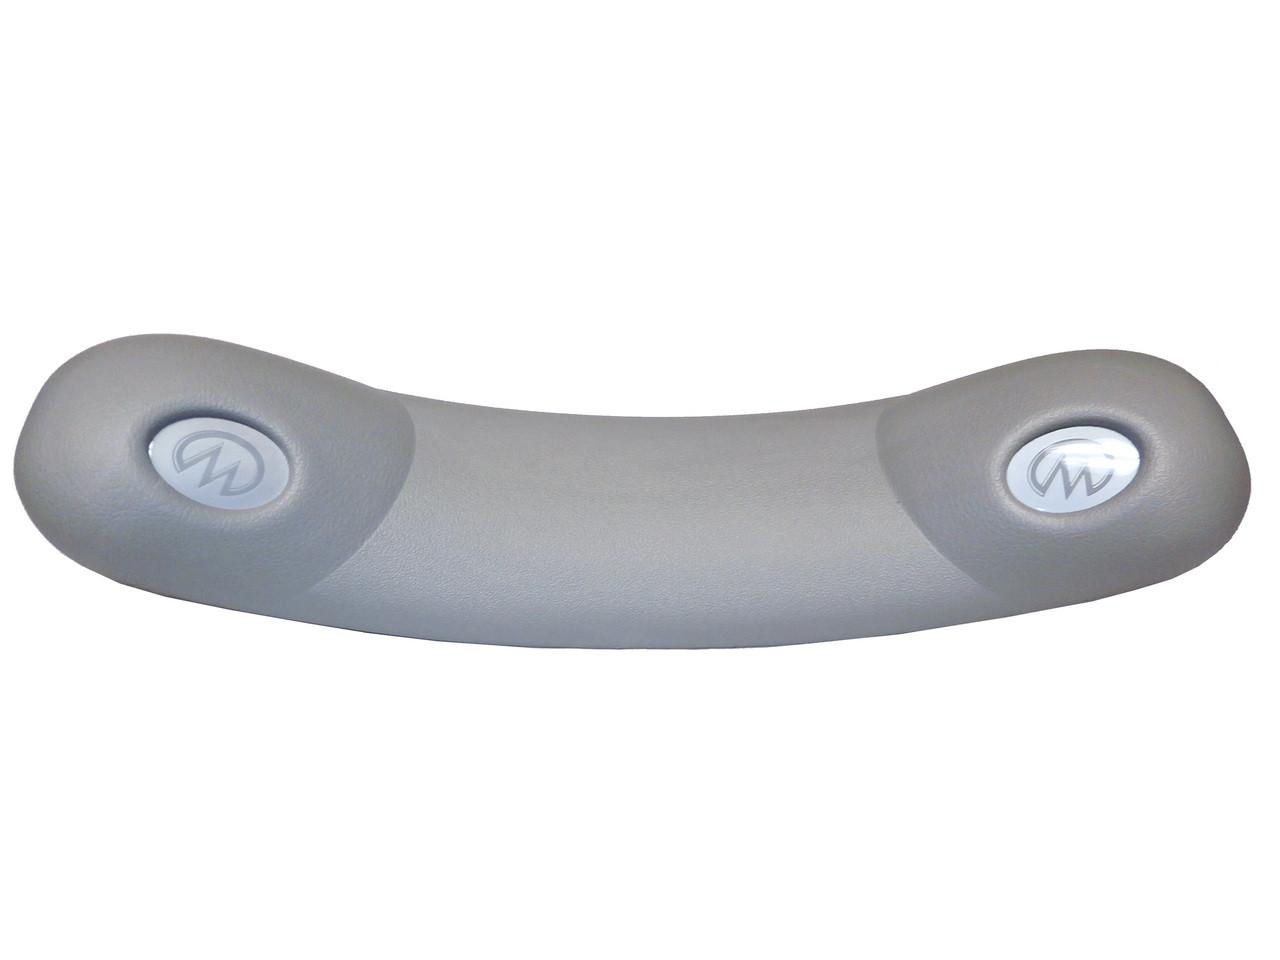 Master Spa - X540710 - Legend Series Wrap Around Pillow - Grey - 2005 to 2009 - Side View